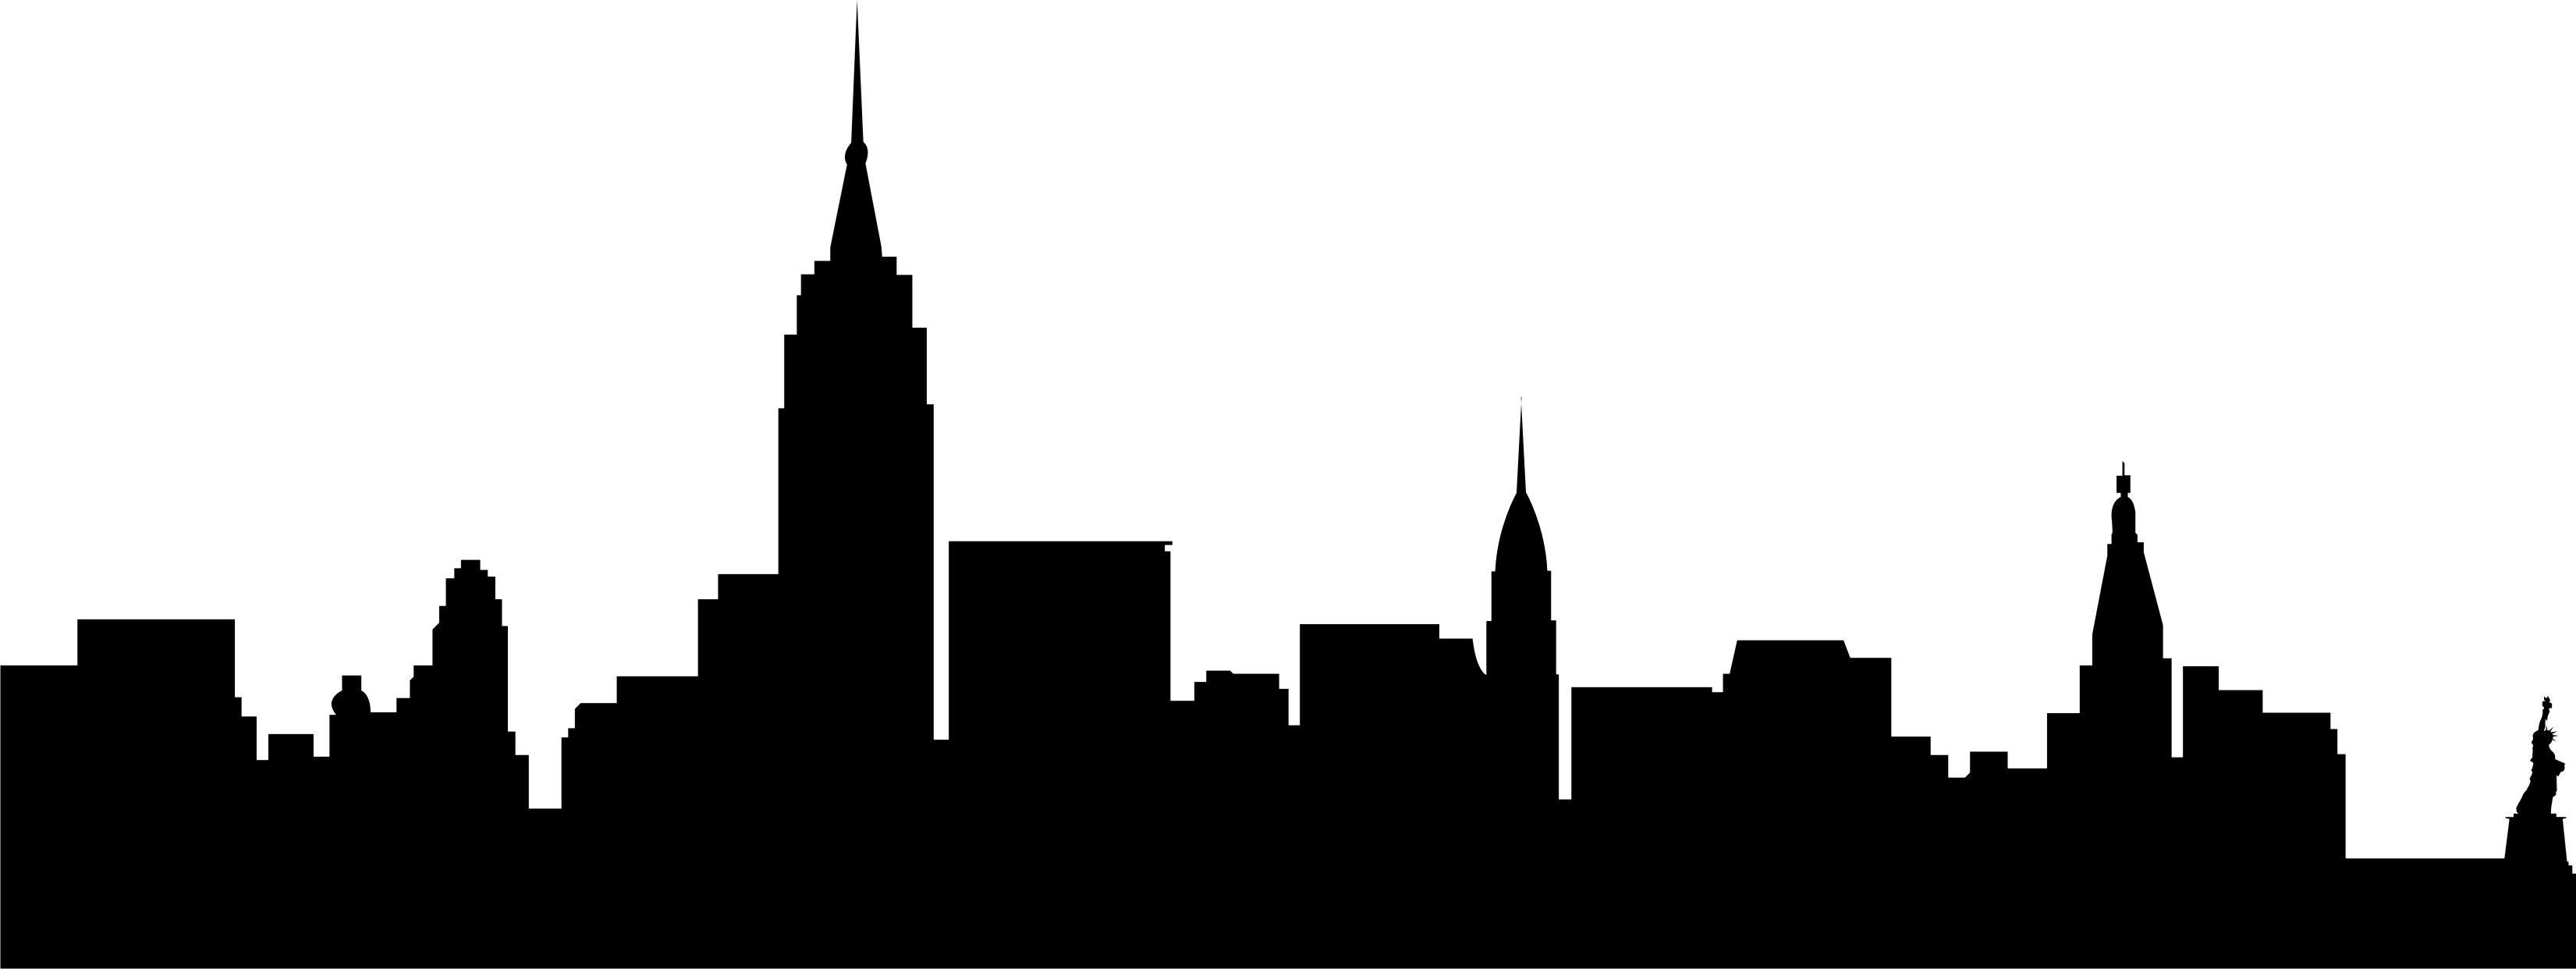 City silhouette clip art. Skyline clipart